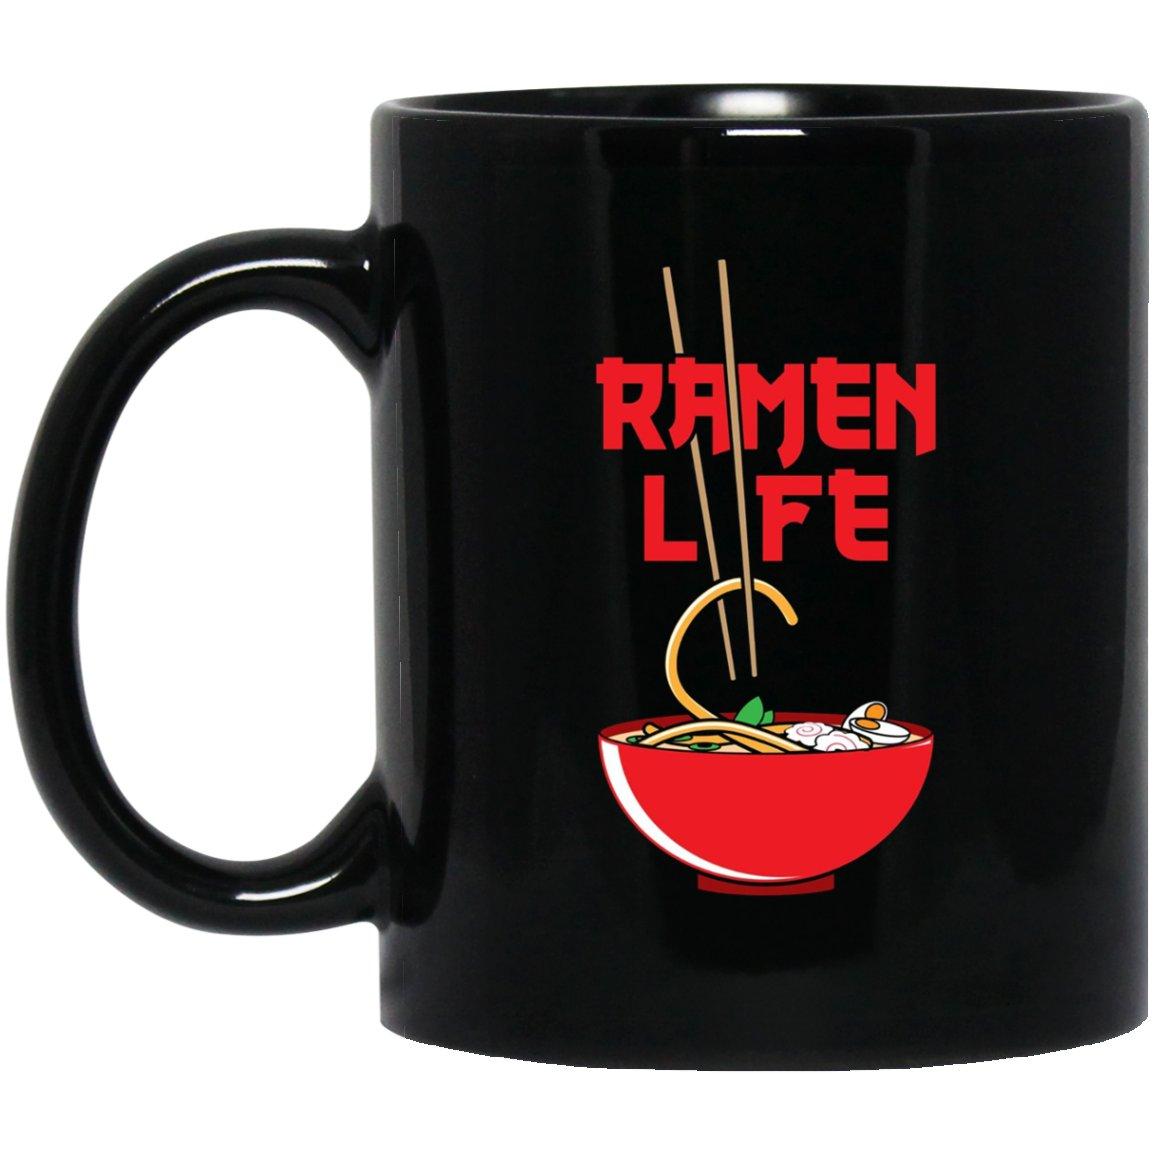 Cute Ramen Funny Ramen Life Student Gift Black  Mug Black Ceramic 11oz Coffee Tea Cup